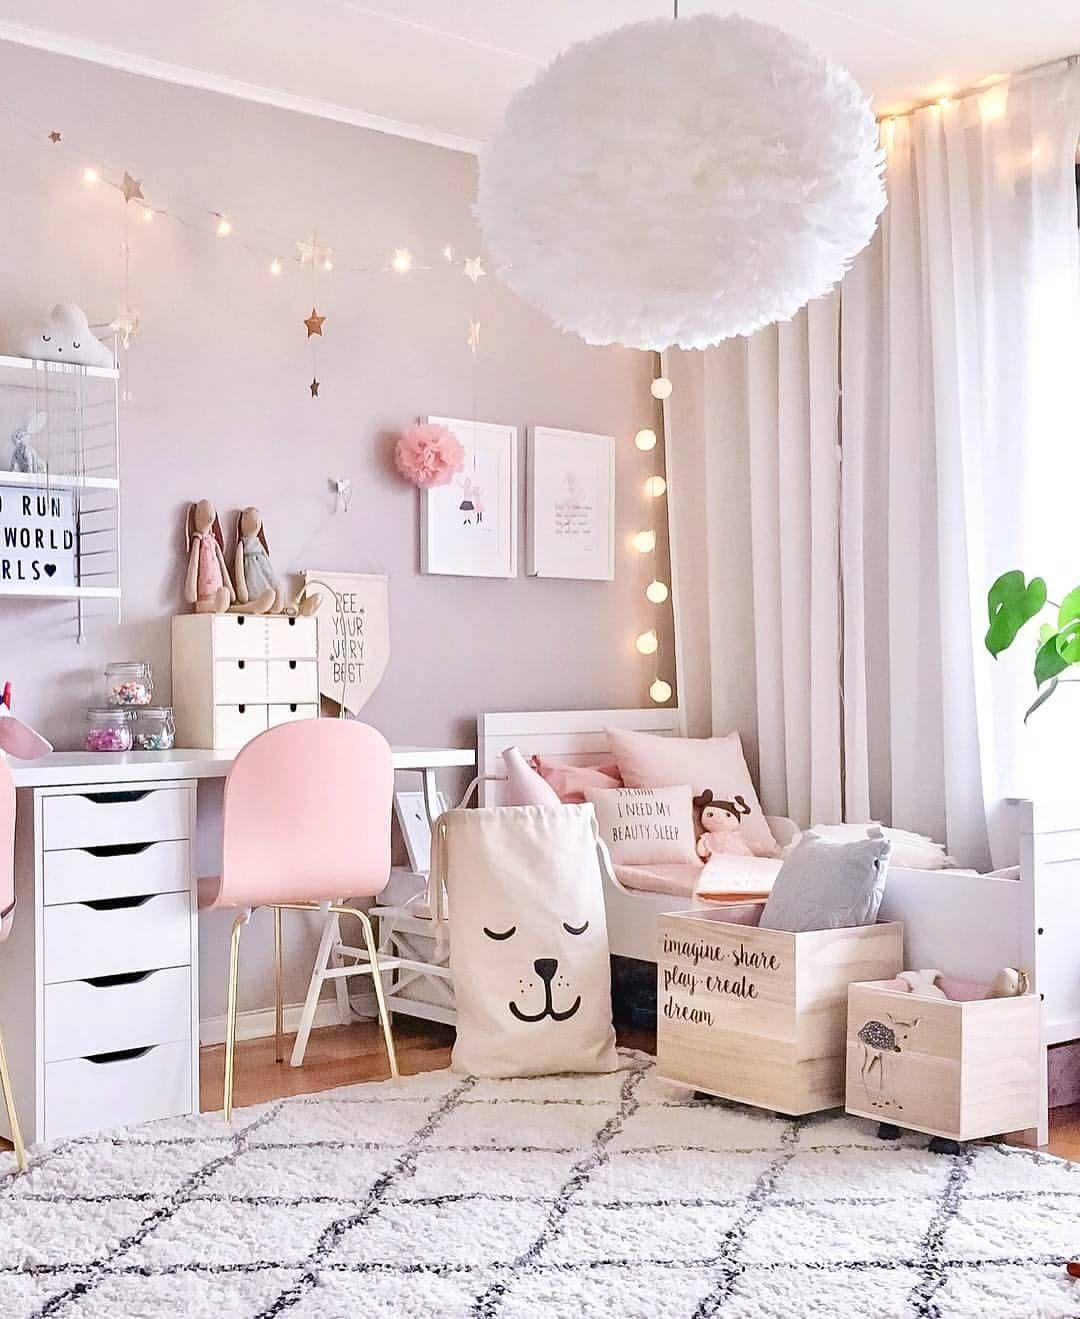 Niedliche vintage raumideen inspiration from instagram  pastel girls room ideas  scandinavian